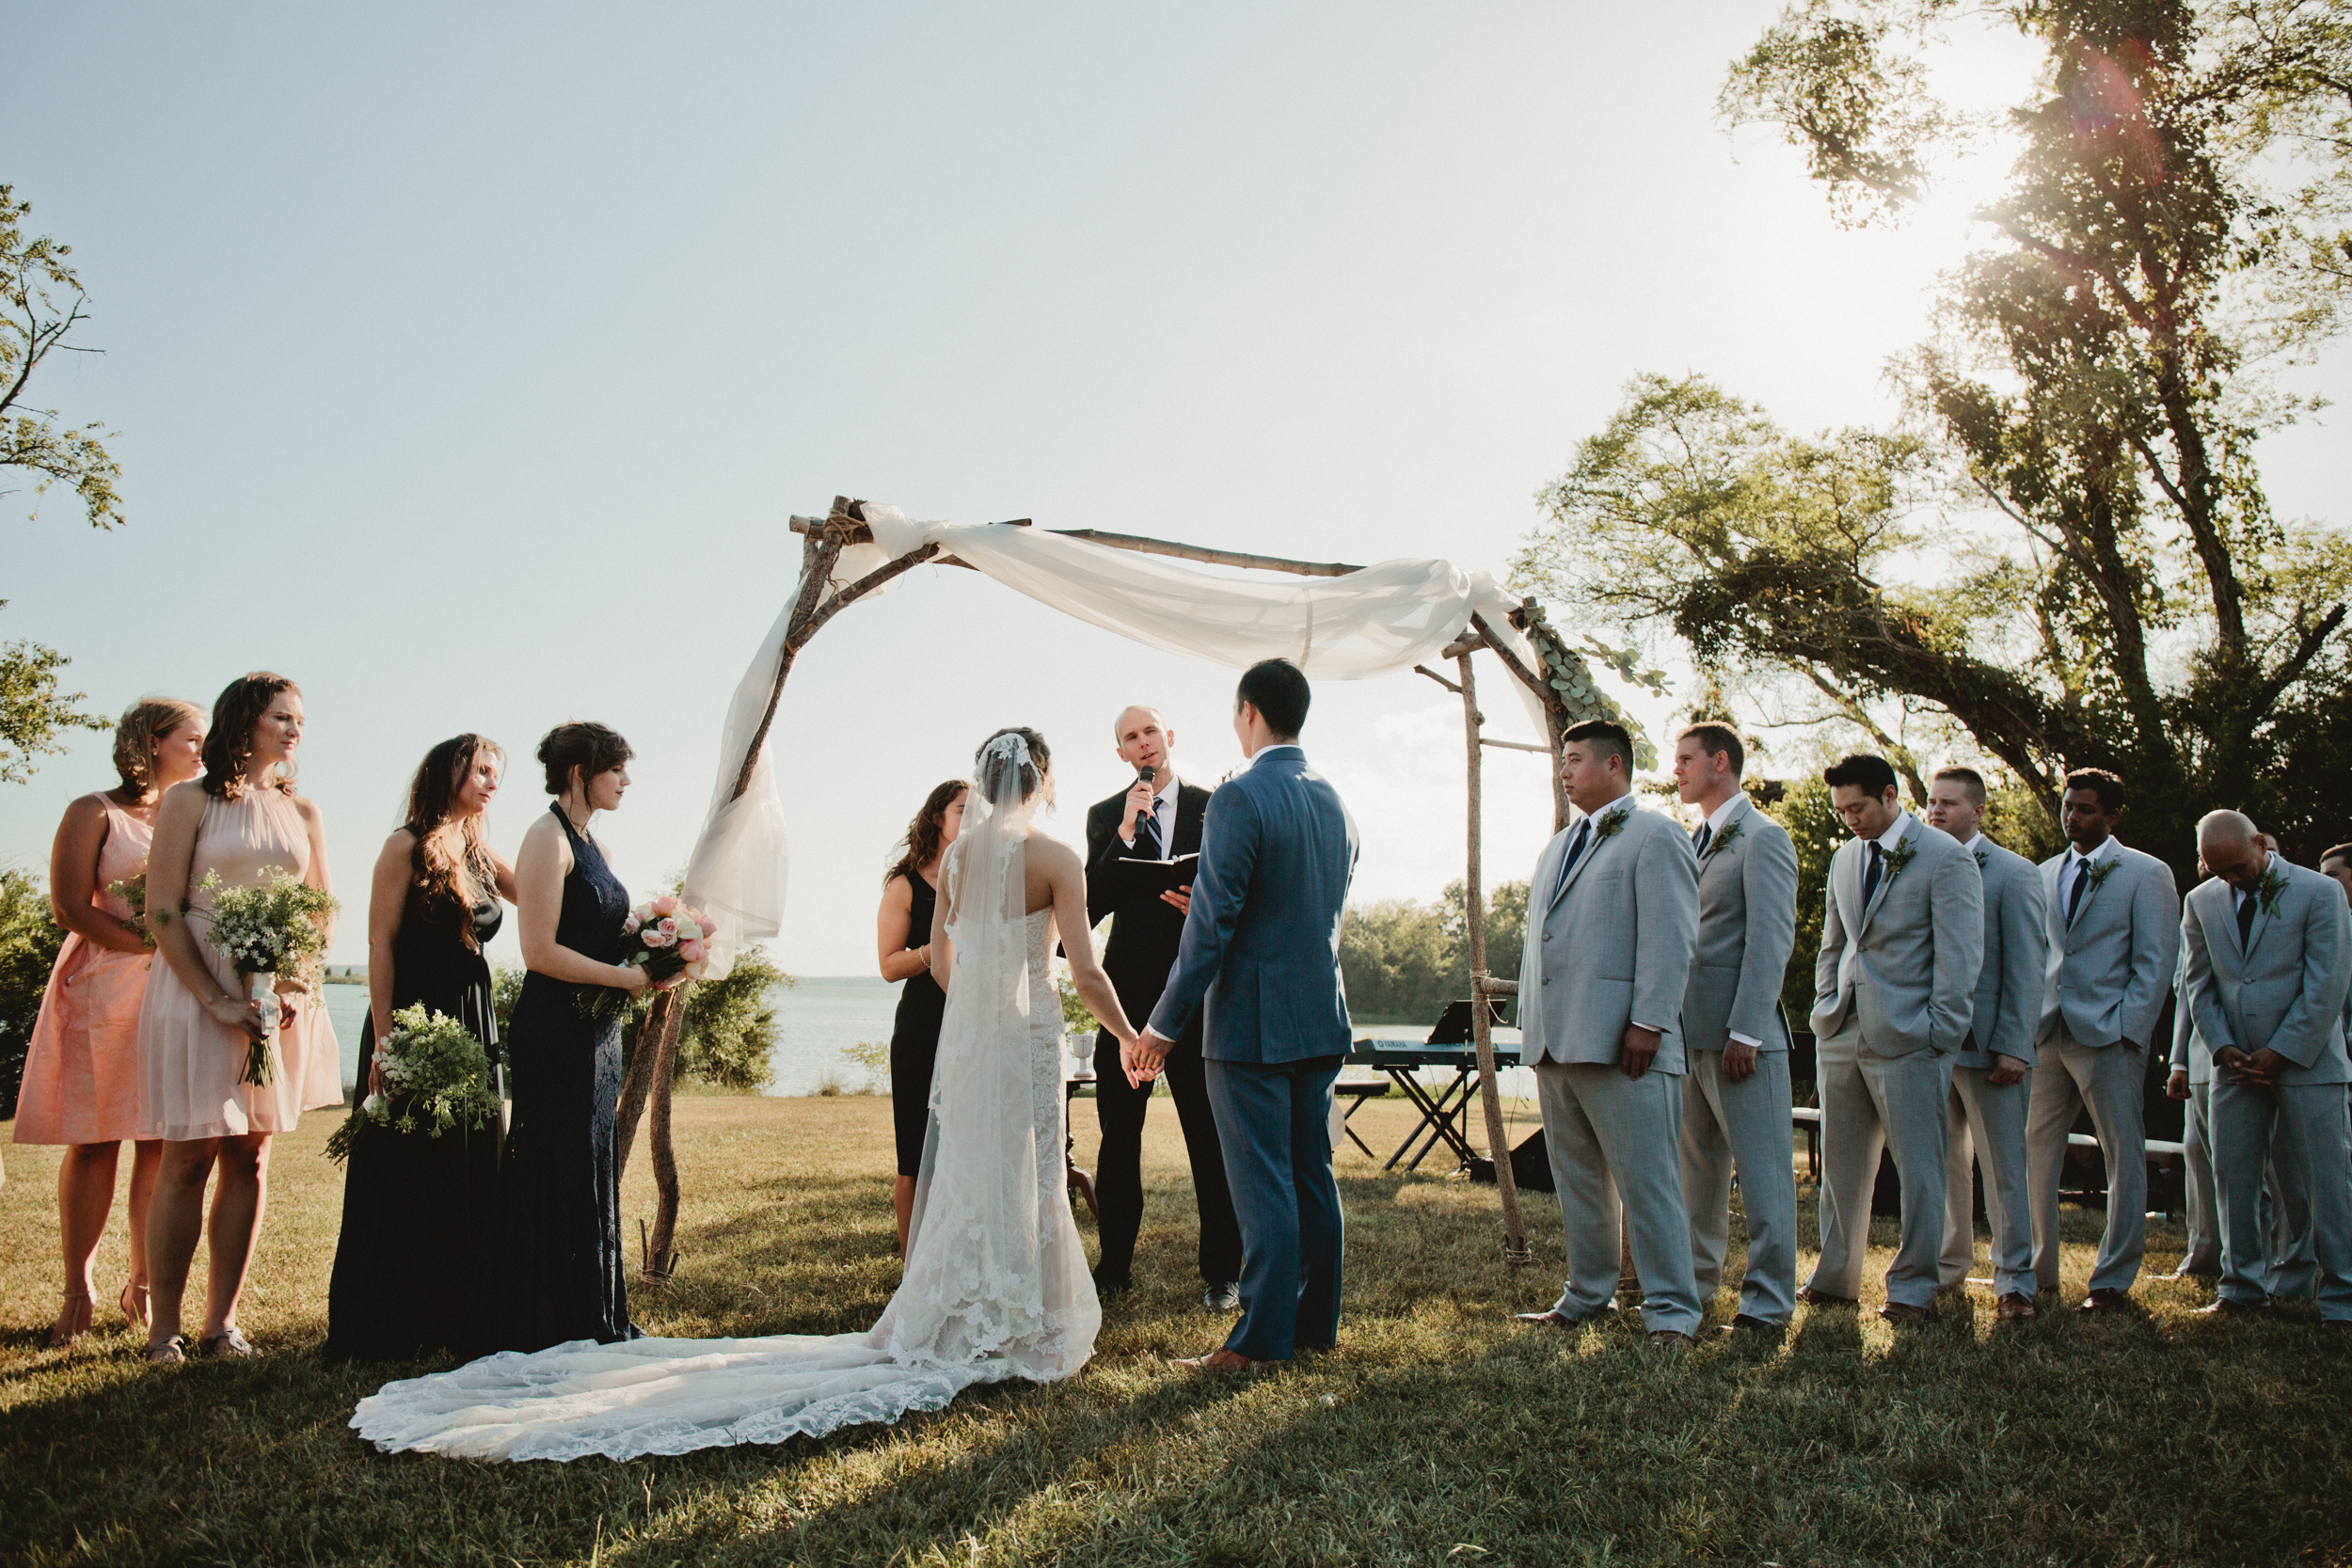 Maine-Wedding-Photographer-1032.jpg